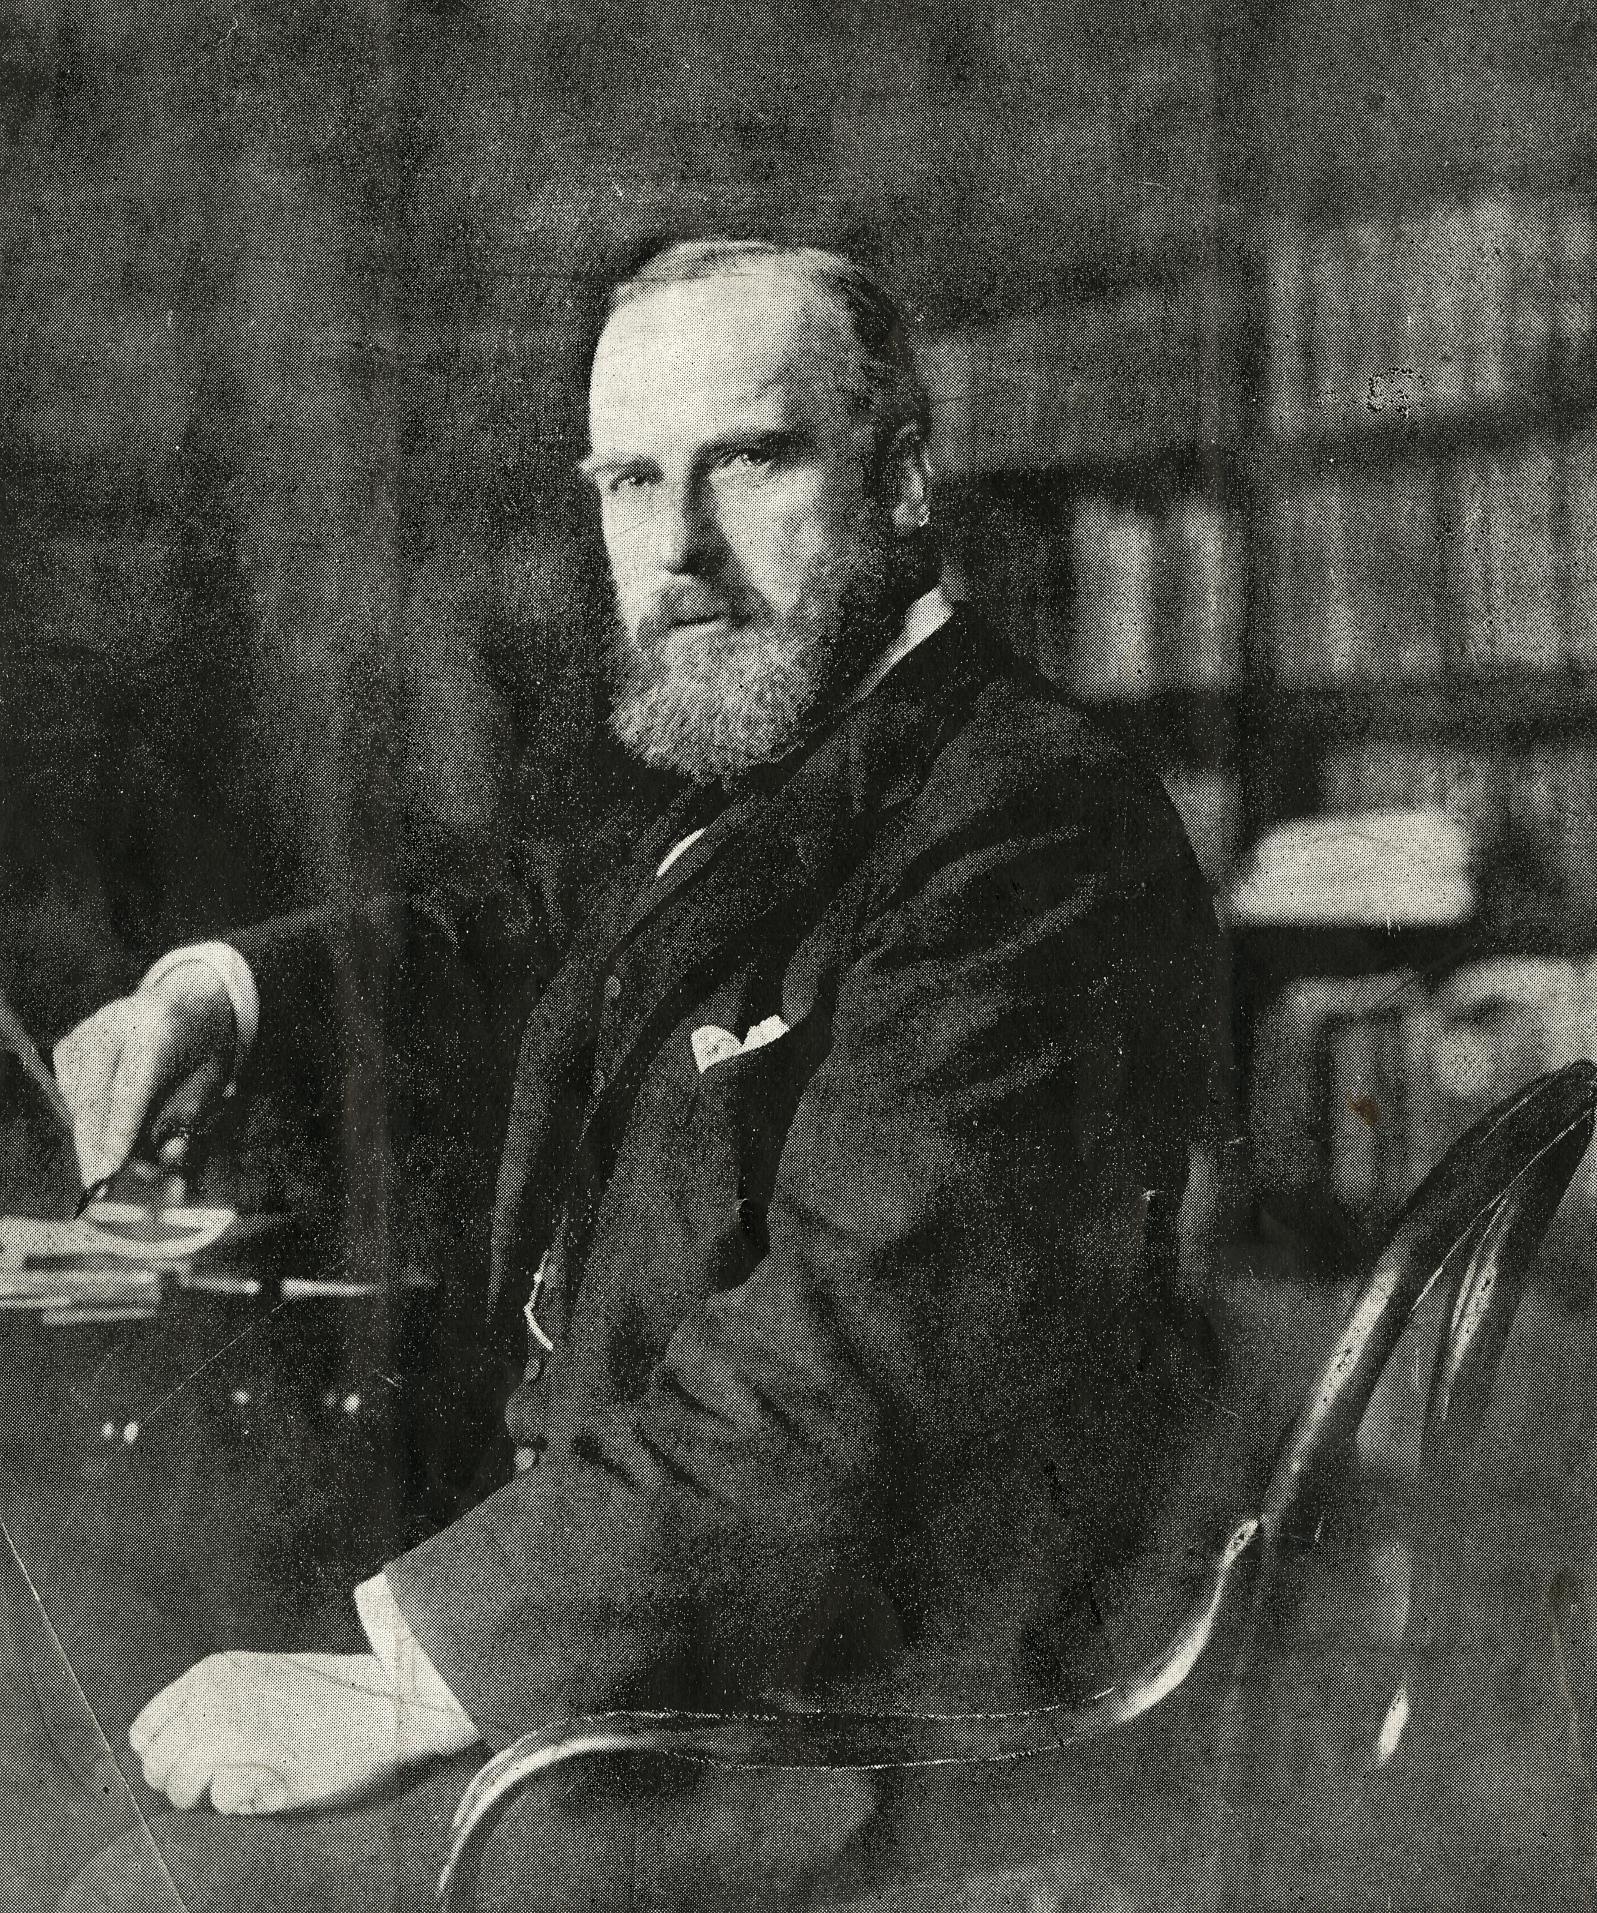 Edward E. Morris, 1896